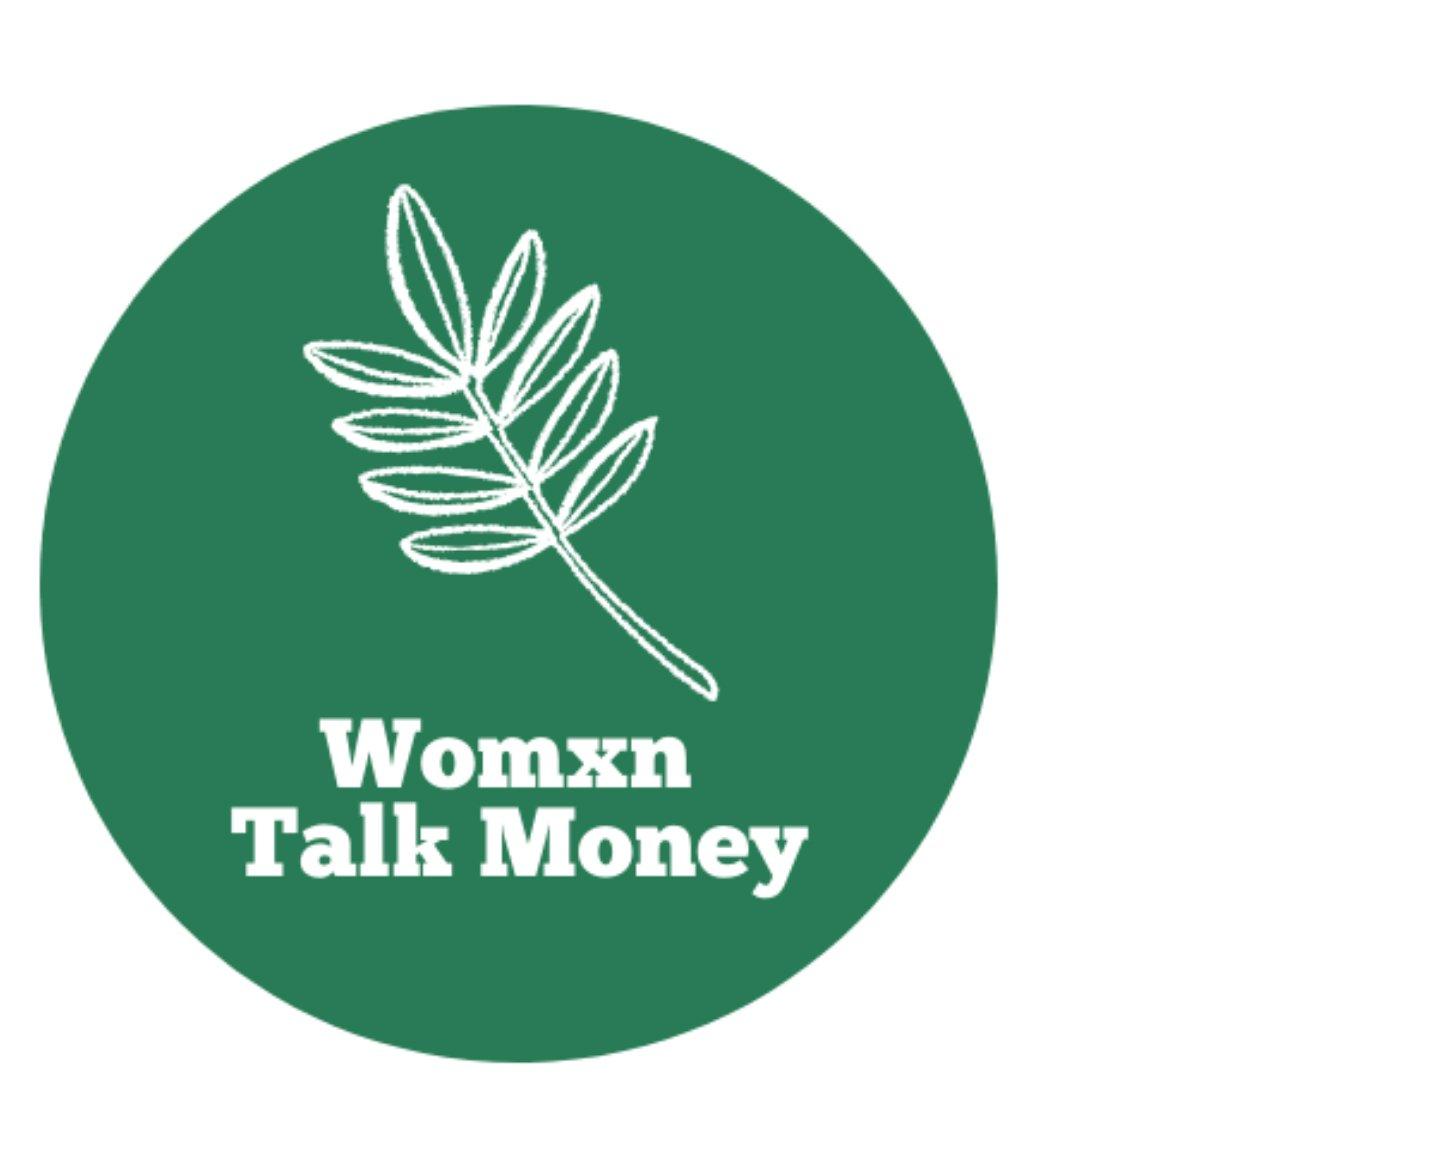 WomxnTalkMoney-green-rightspace